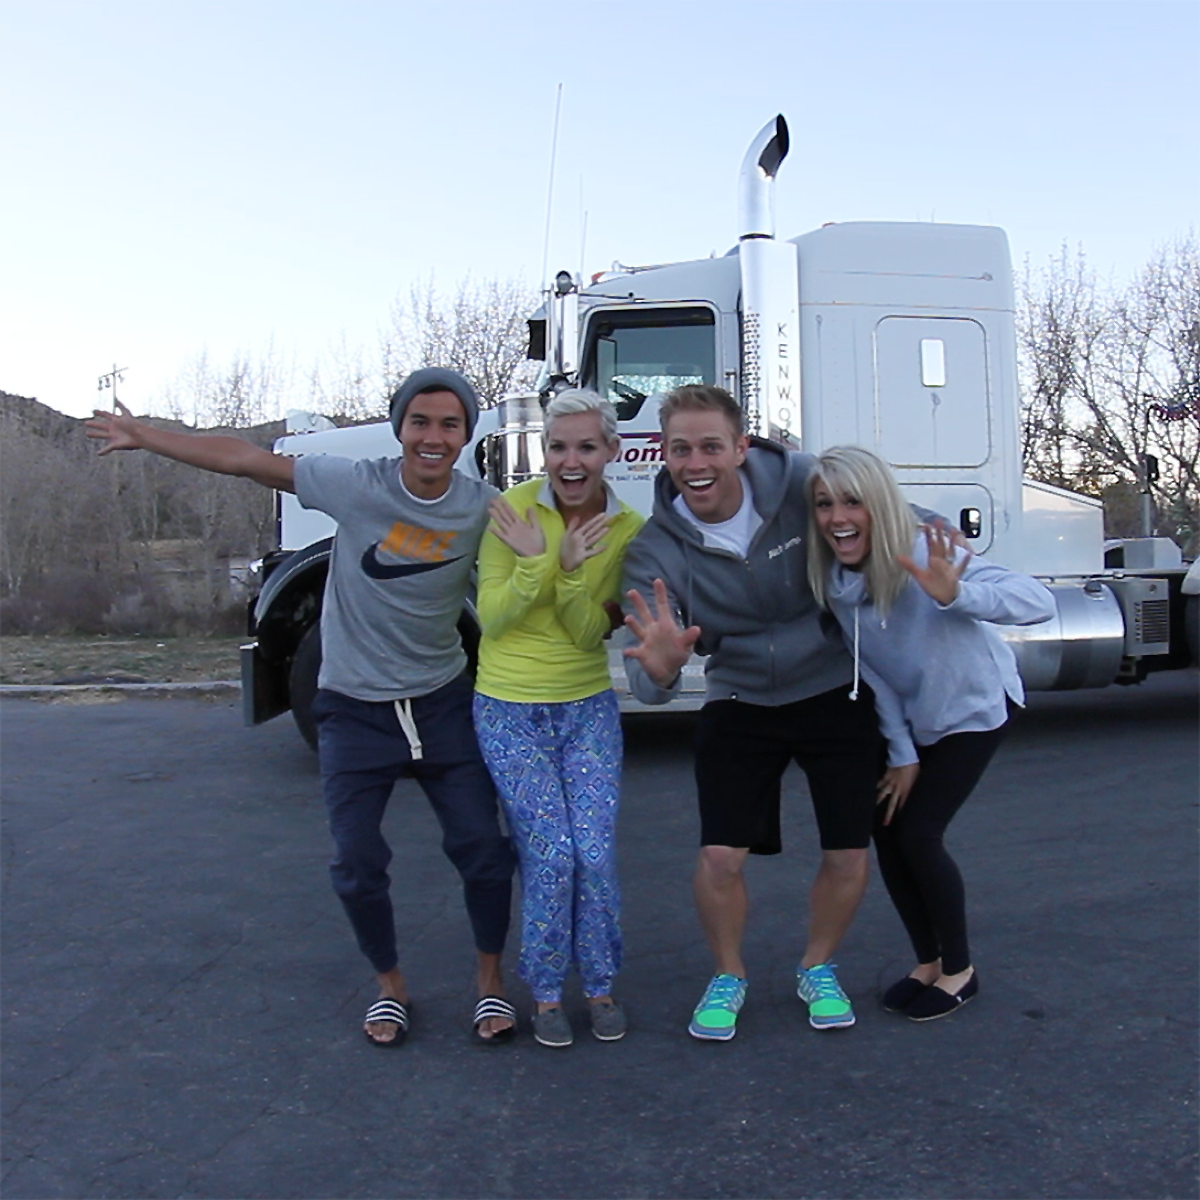 tahiti adventure 5 crew